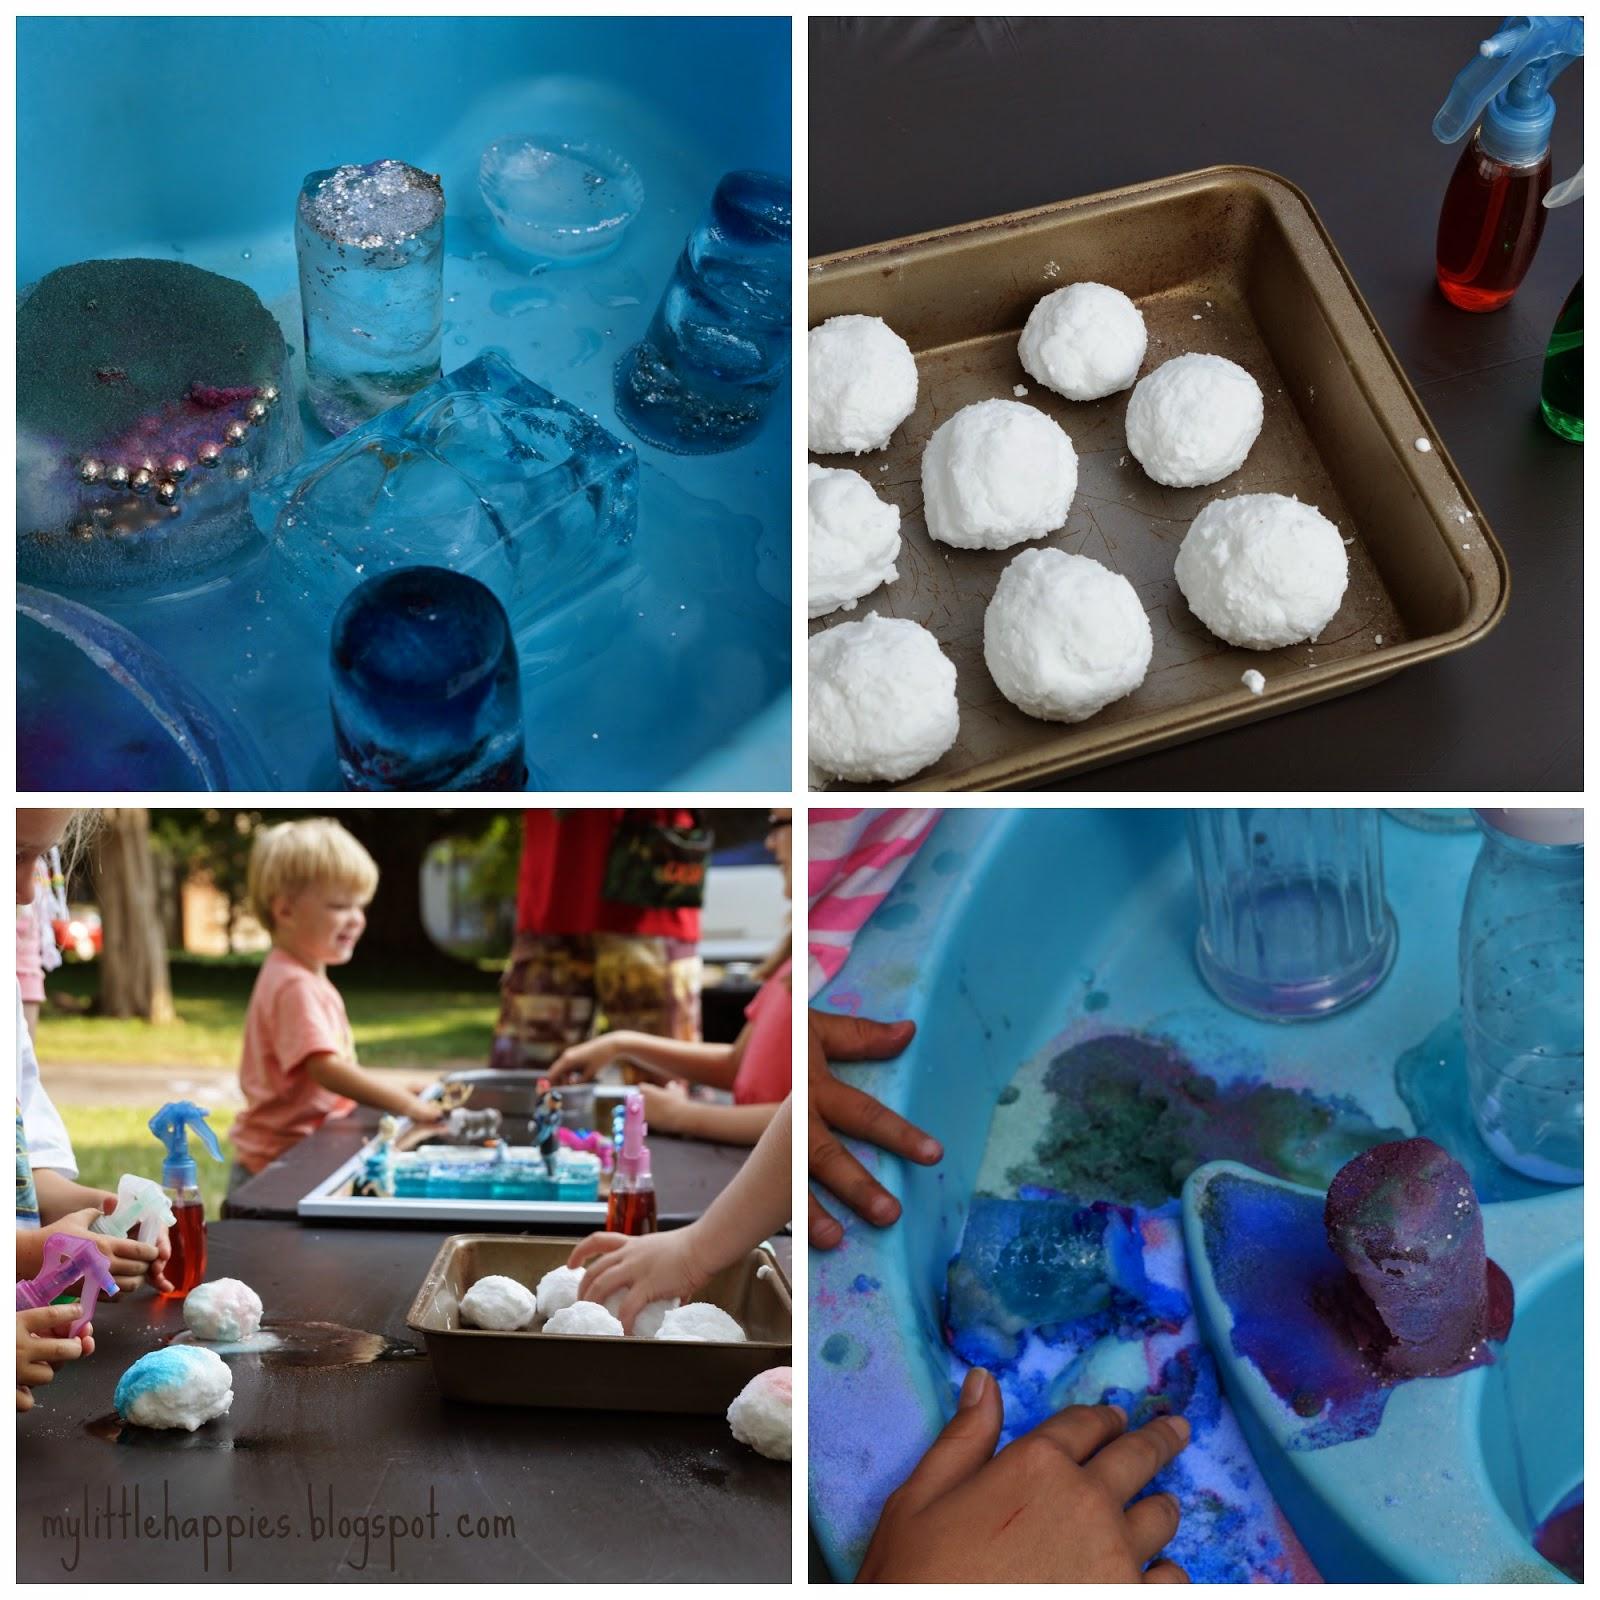 Enjoyable Little Happies Frozen Fun Inspired Art Sensory Camp Machost Co Dining Chair Design Ideas Machostcouk